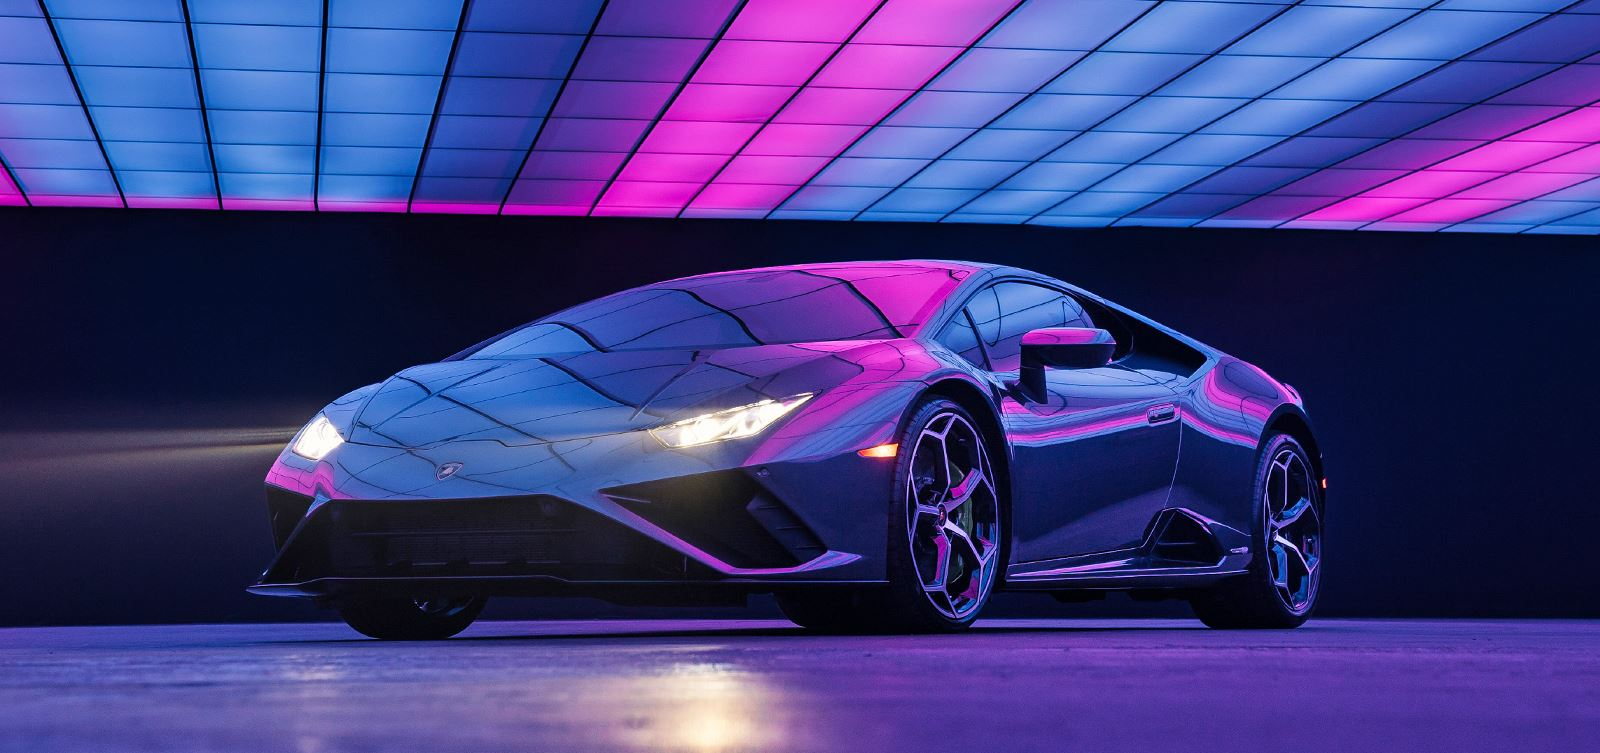 Charity-Gewinnspiel von Automobili Lamborghini und Lady Gaga